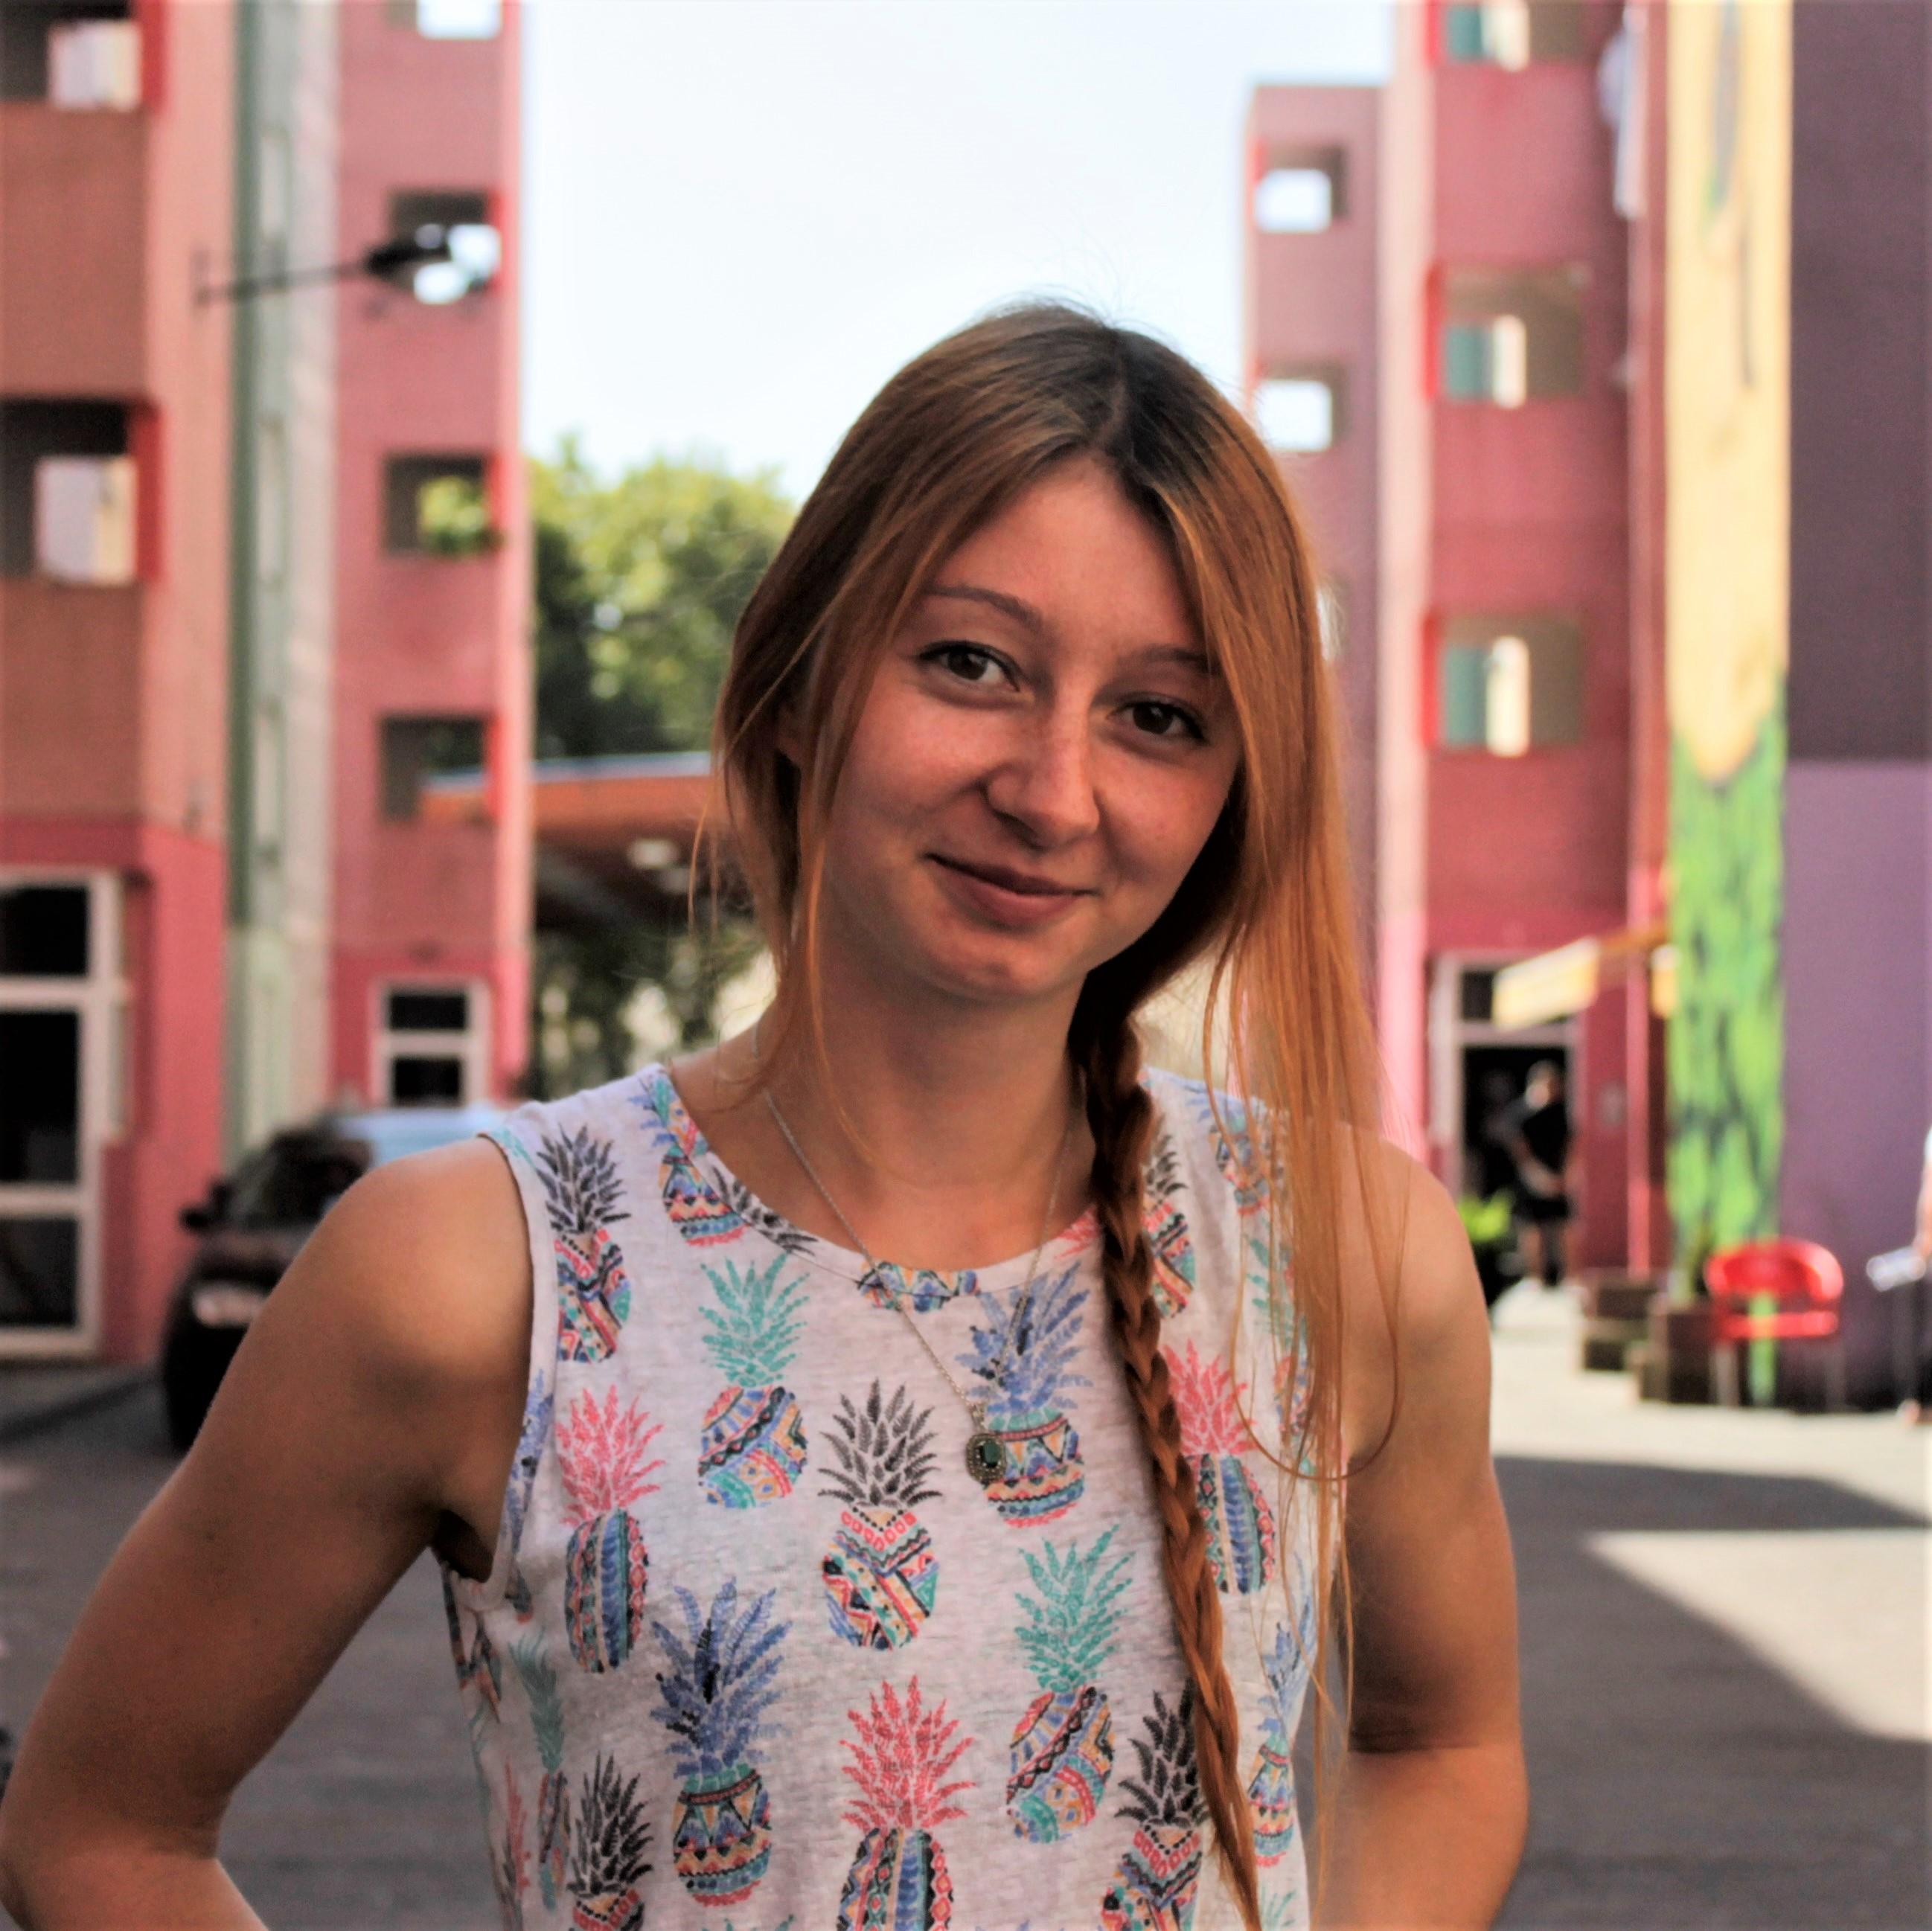 Julia Kowol